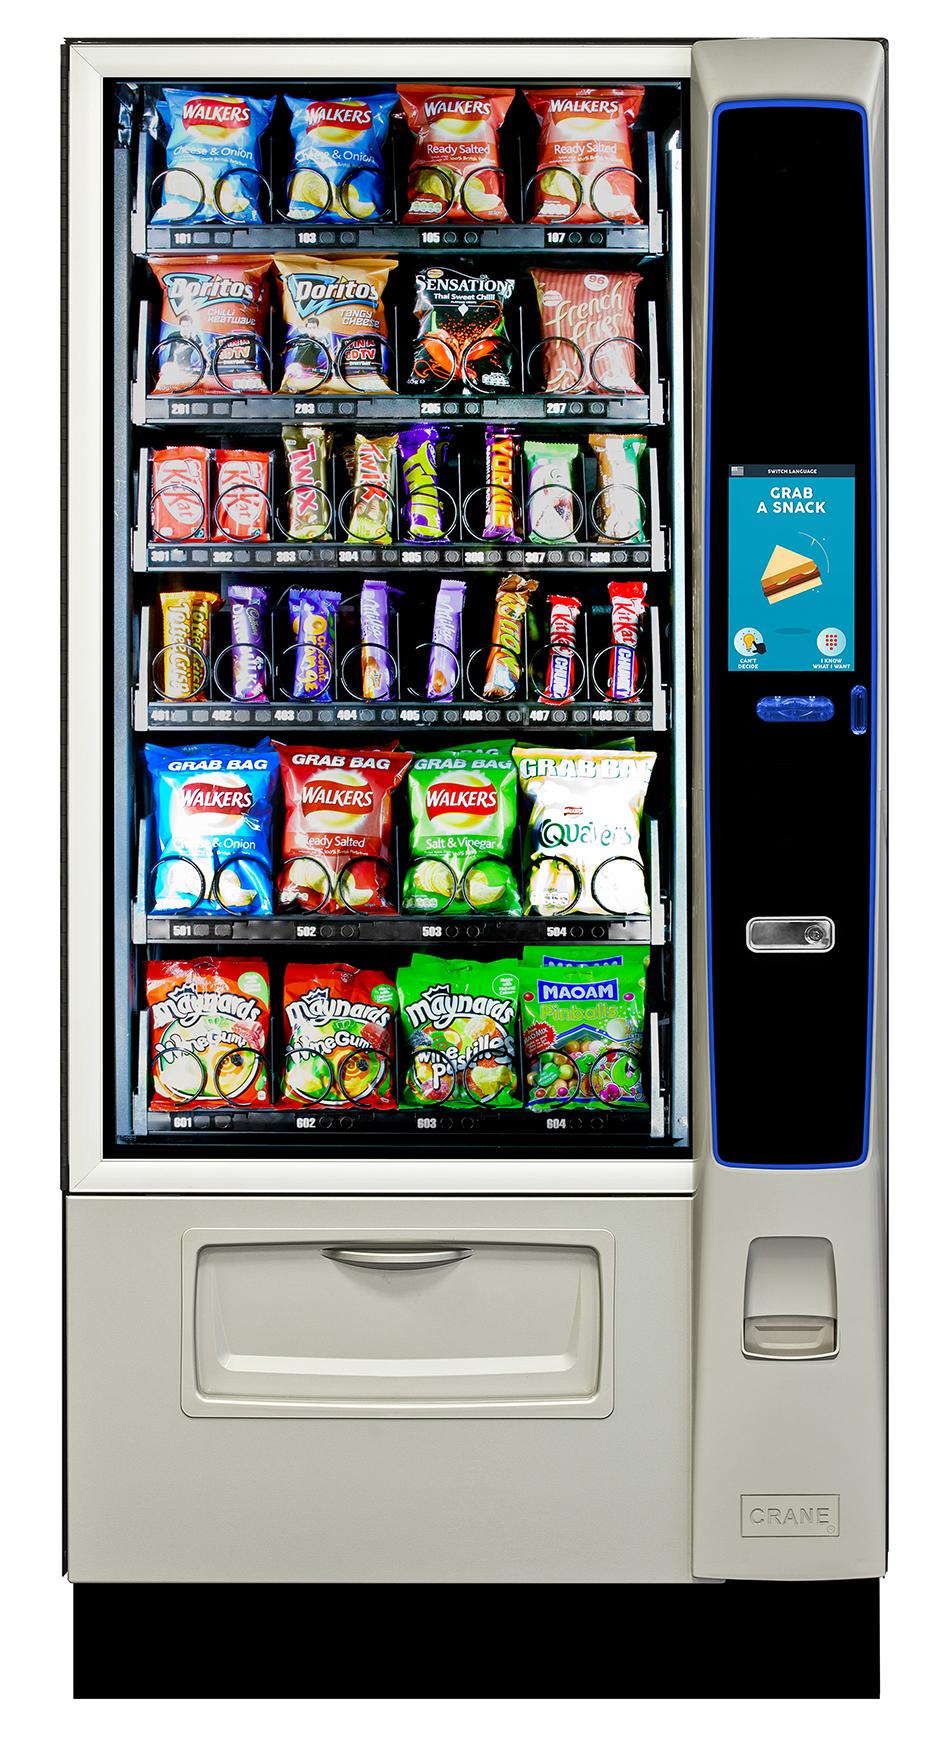 Merchant Media 2 4 Snack Machine